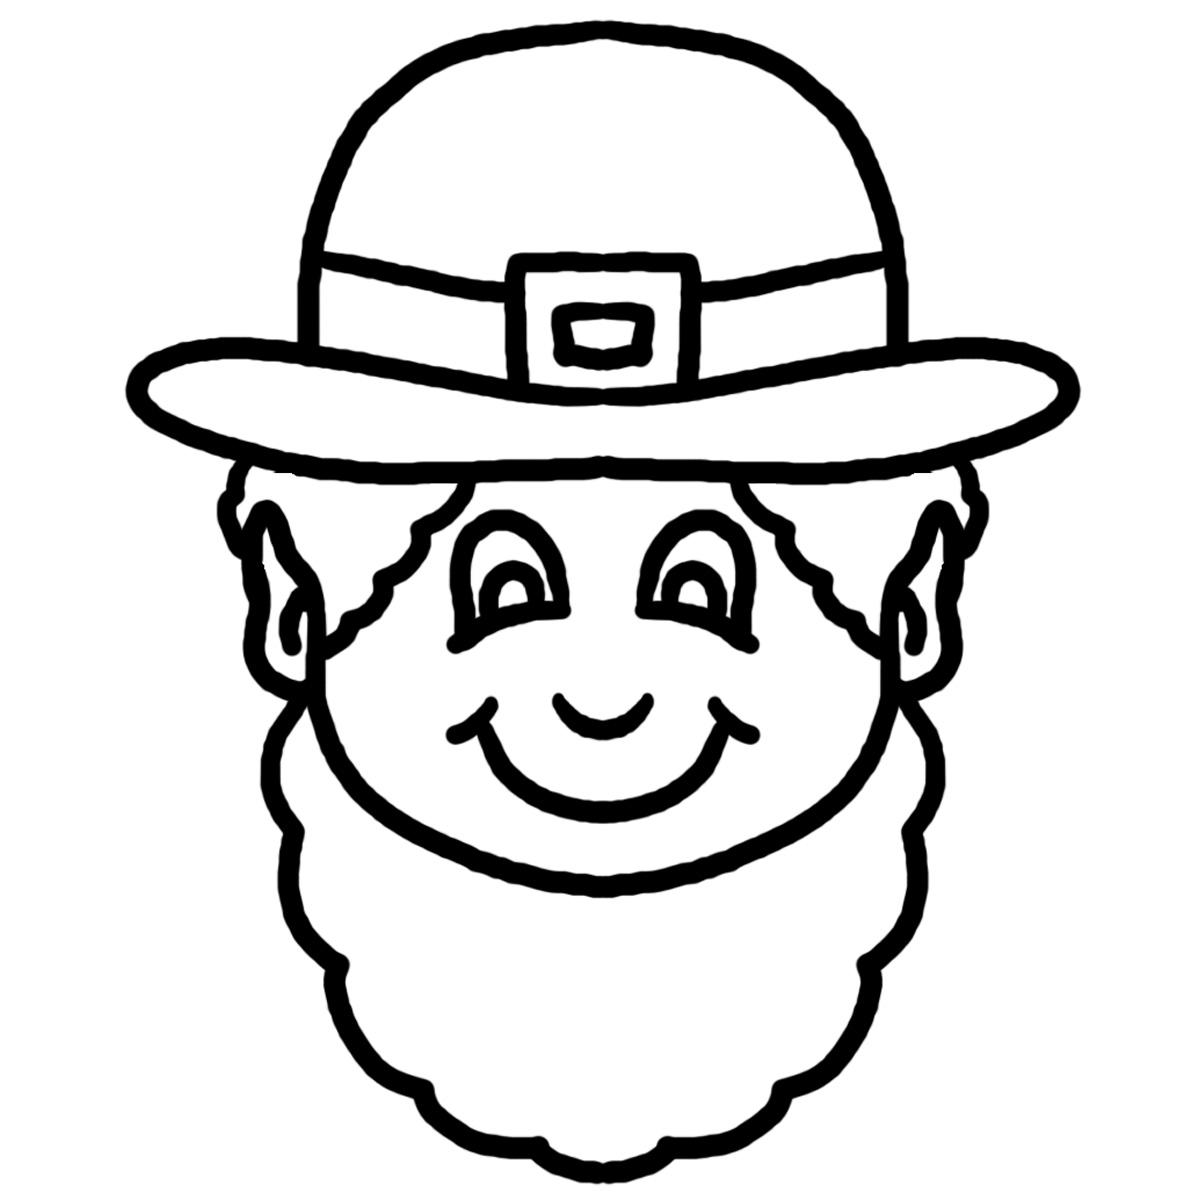 Clip Art: Leprechaun Hat with Four.